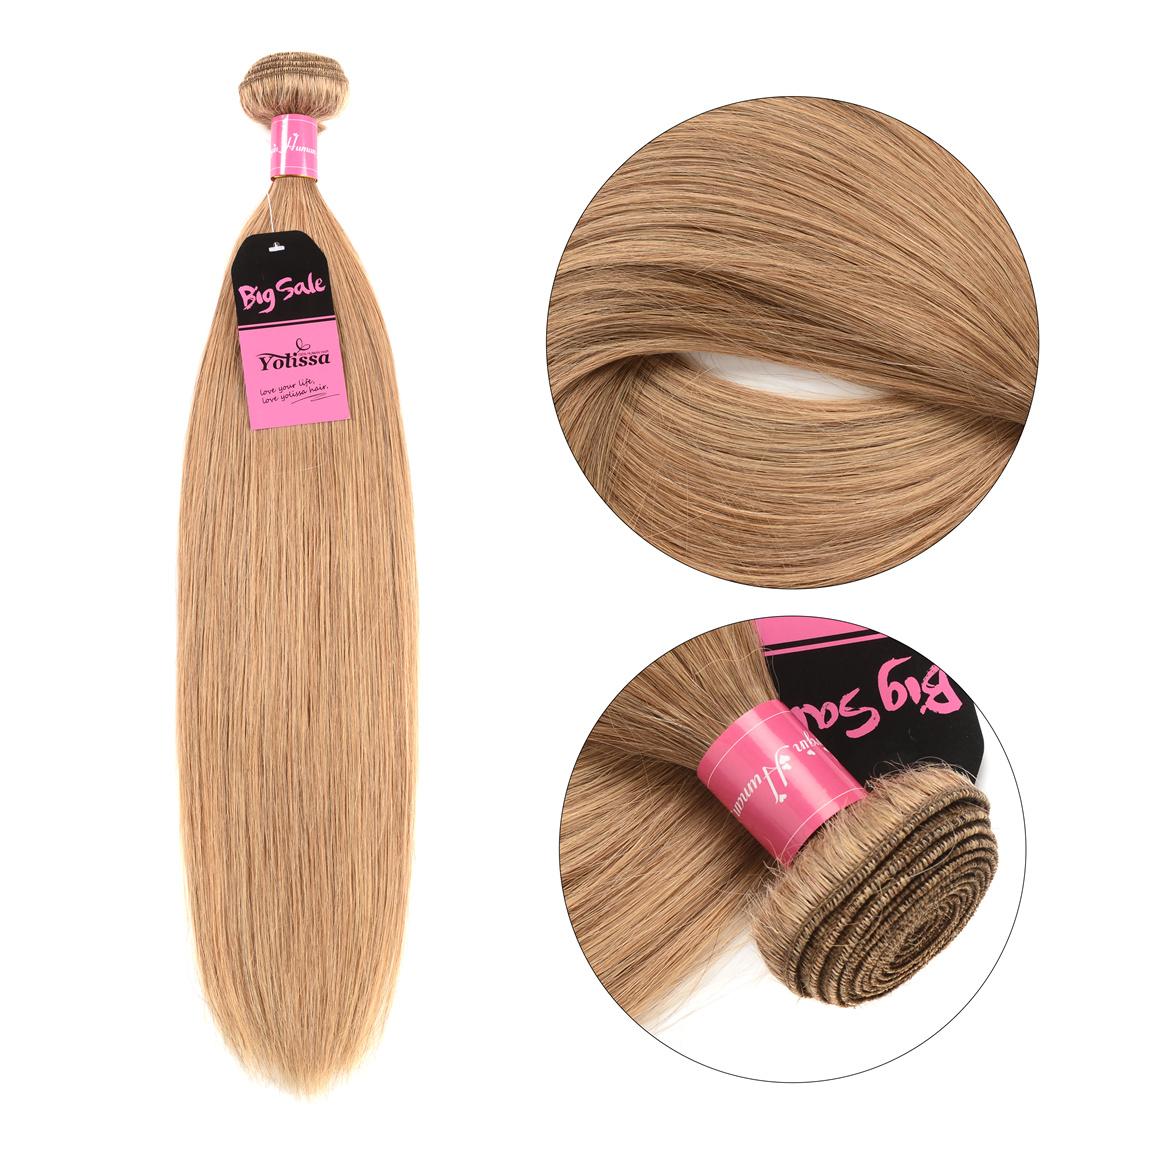 Honey Blond Straight Hair 4 Bundles